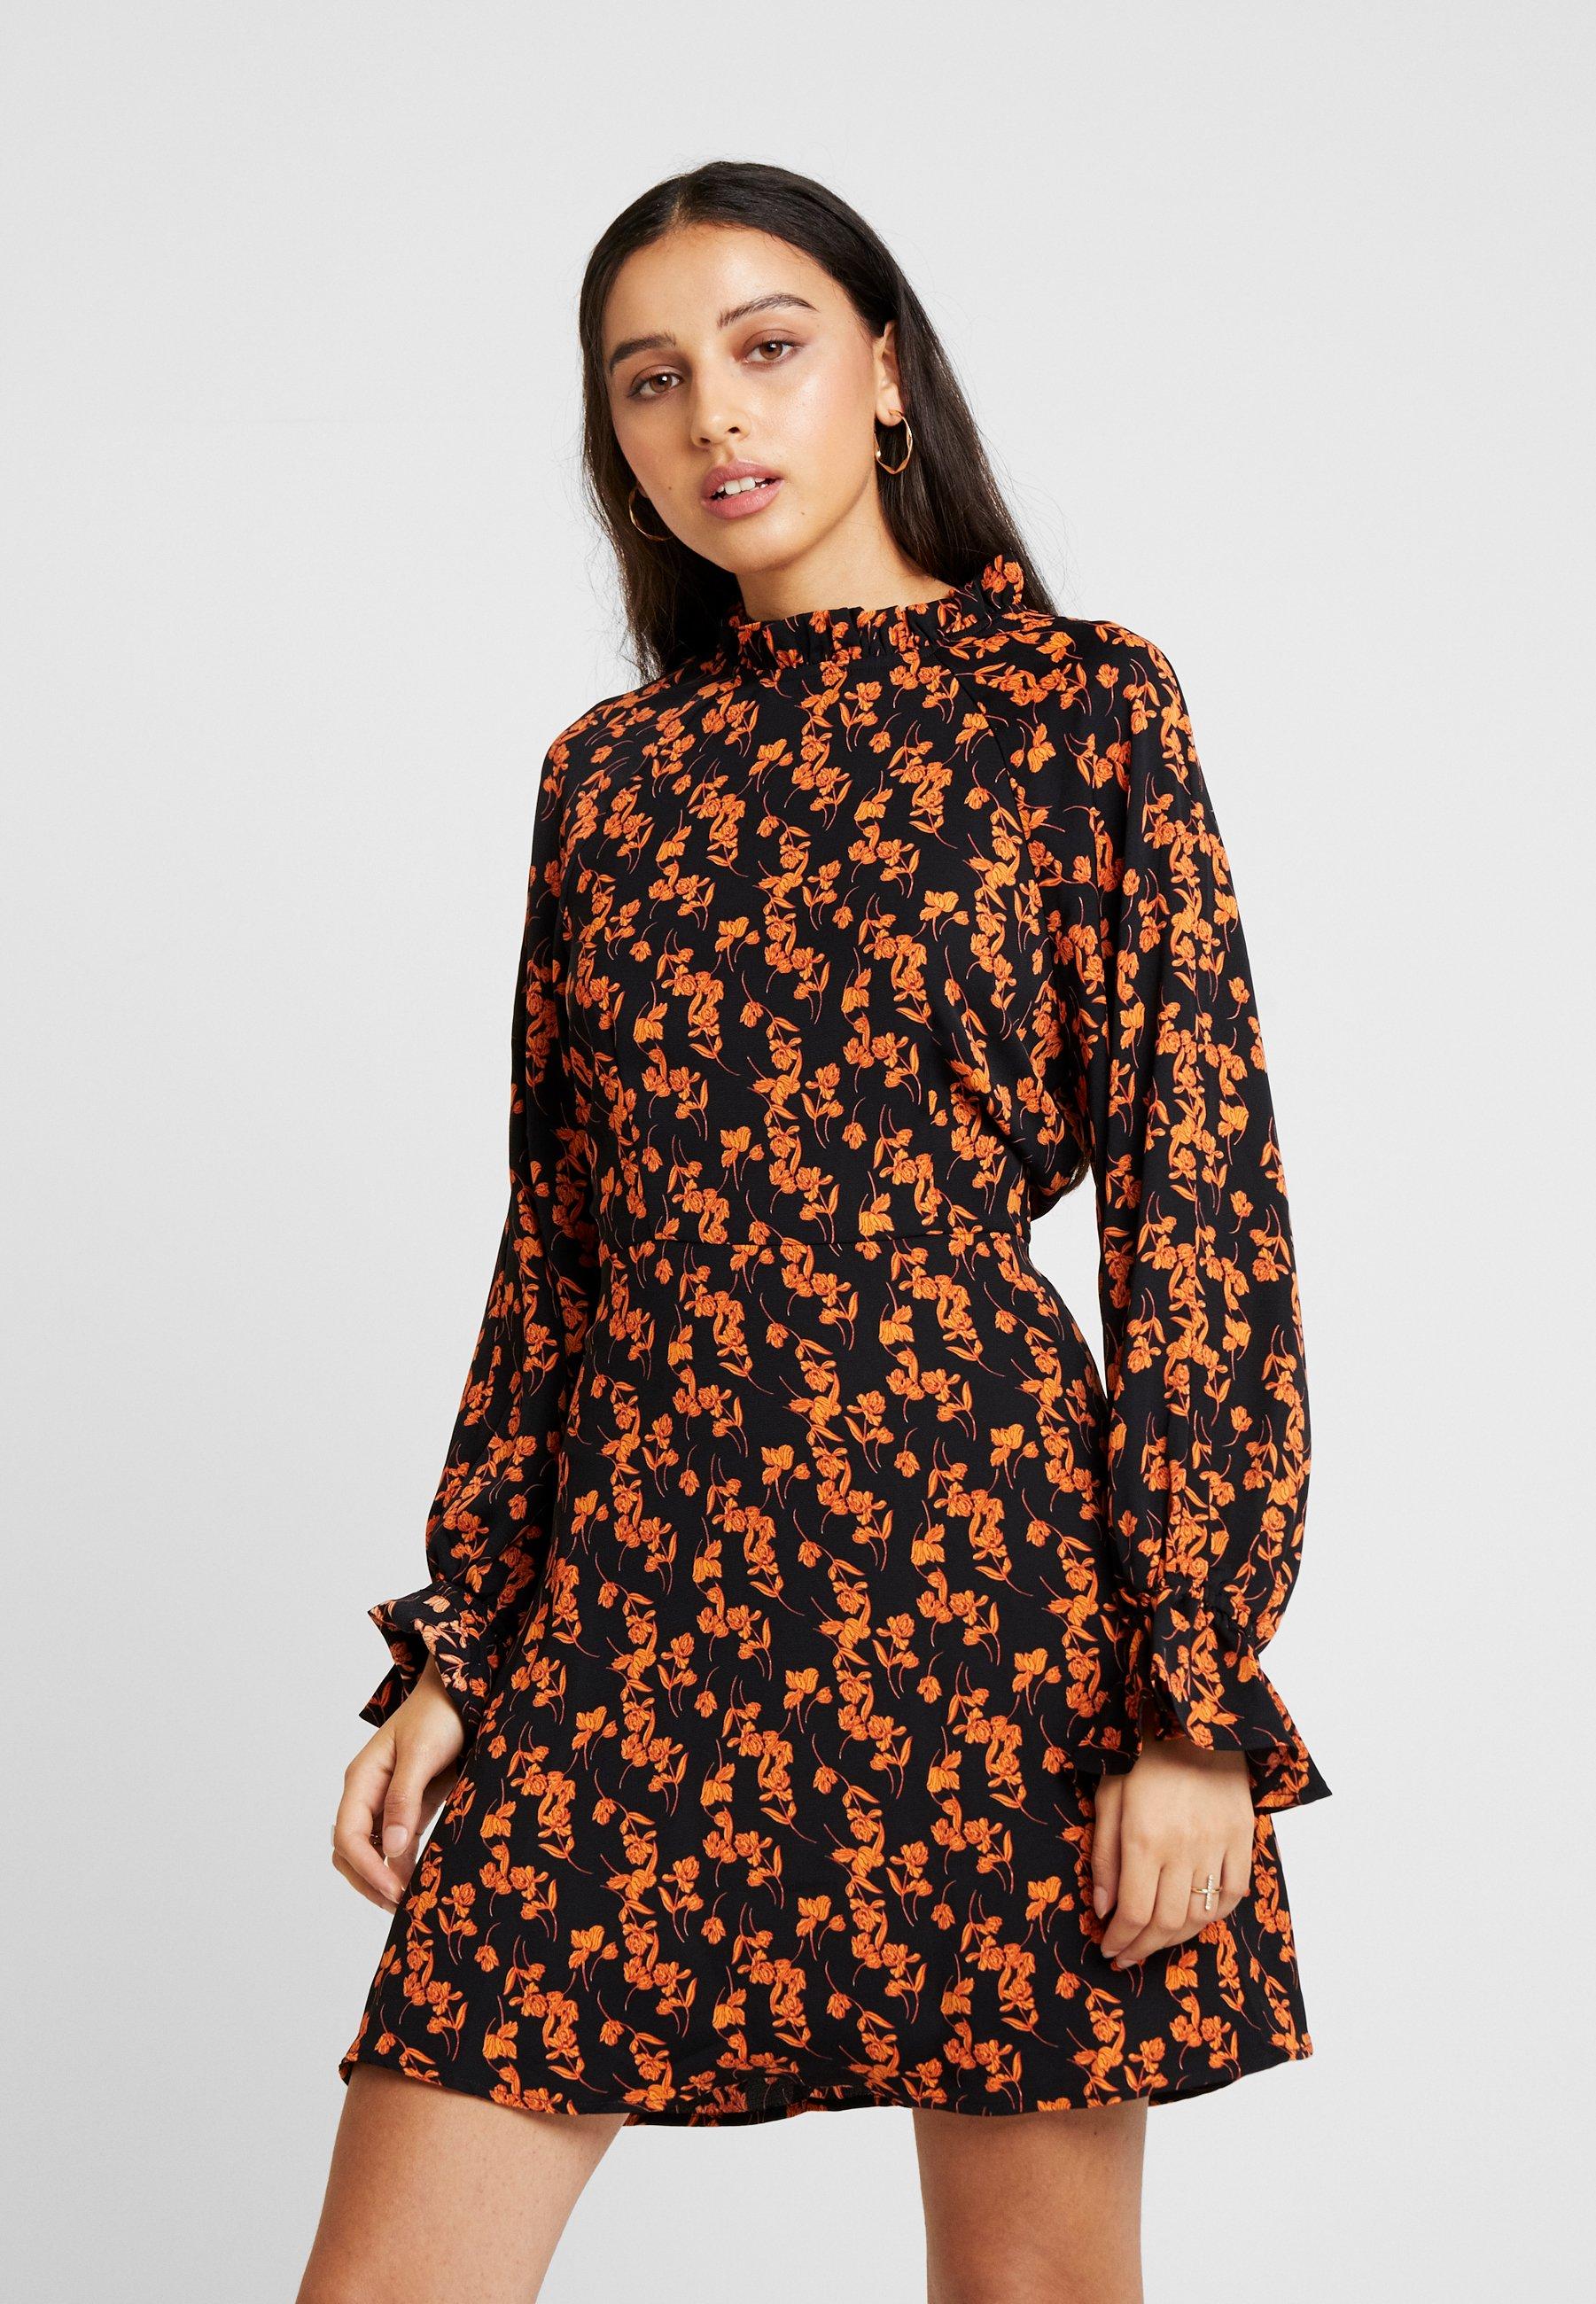 Sleeves Missguided Black Purposeful Flared D'été Floral DressRobe Mini 354cRjAqL